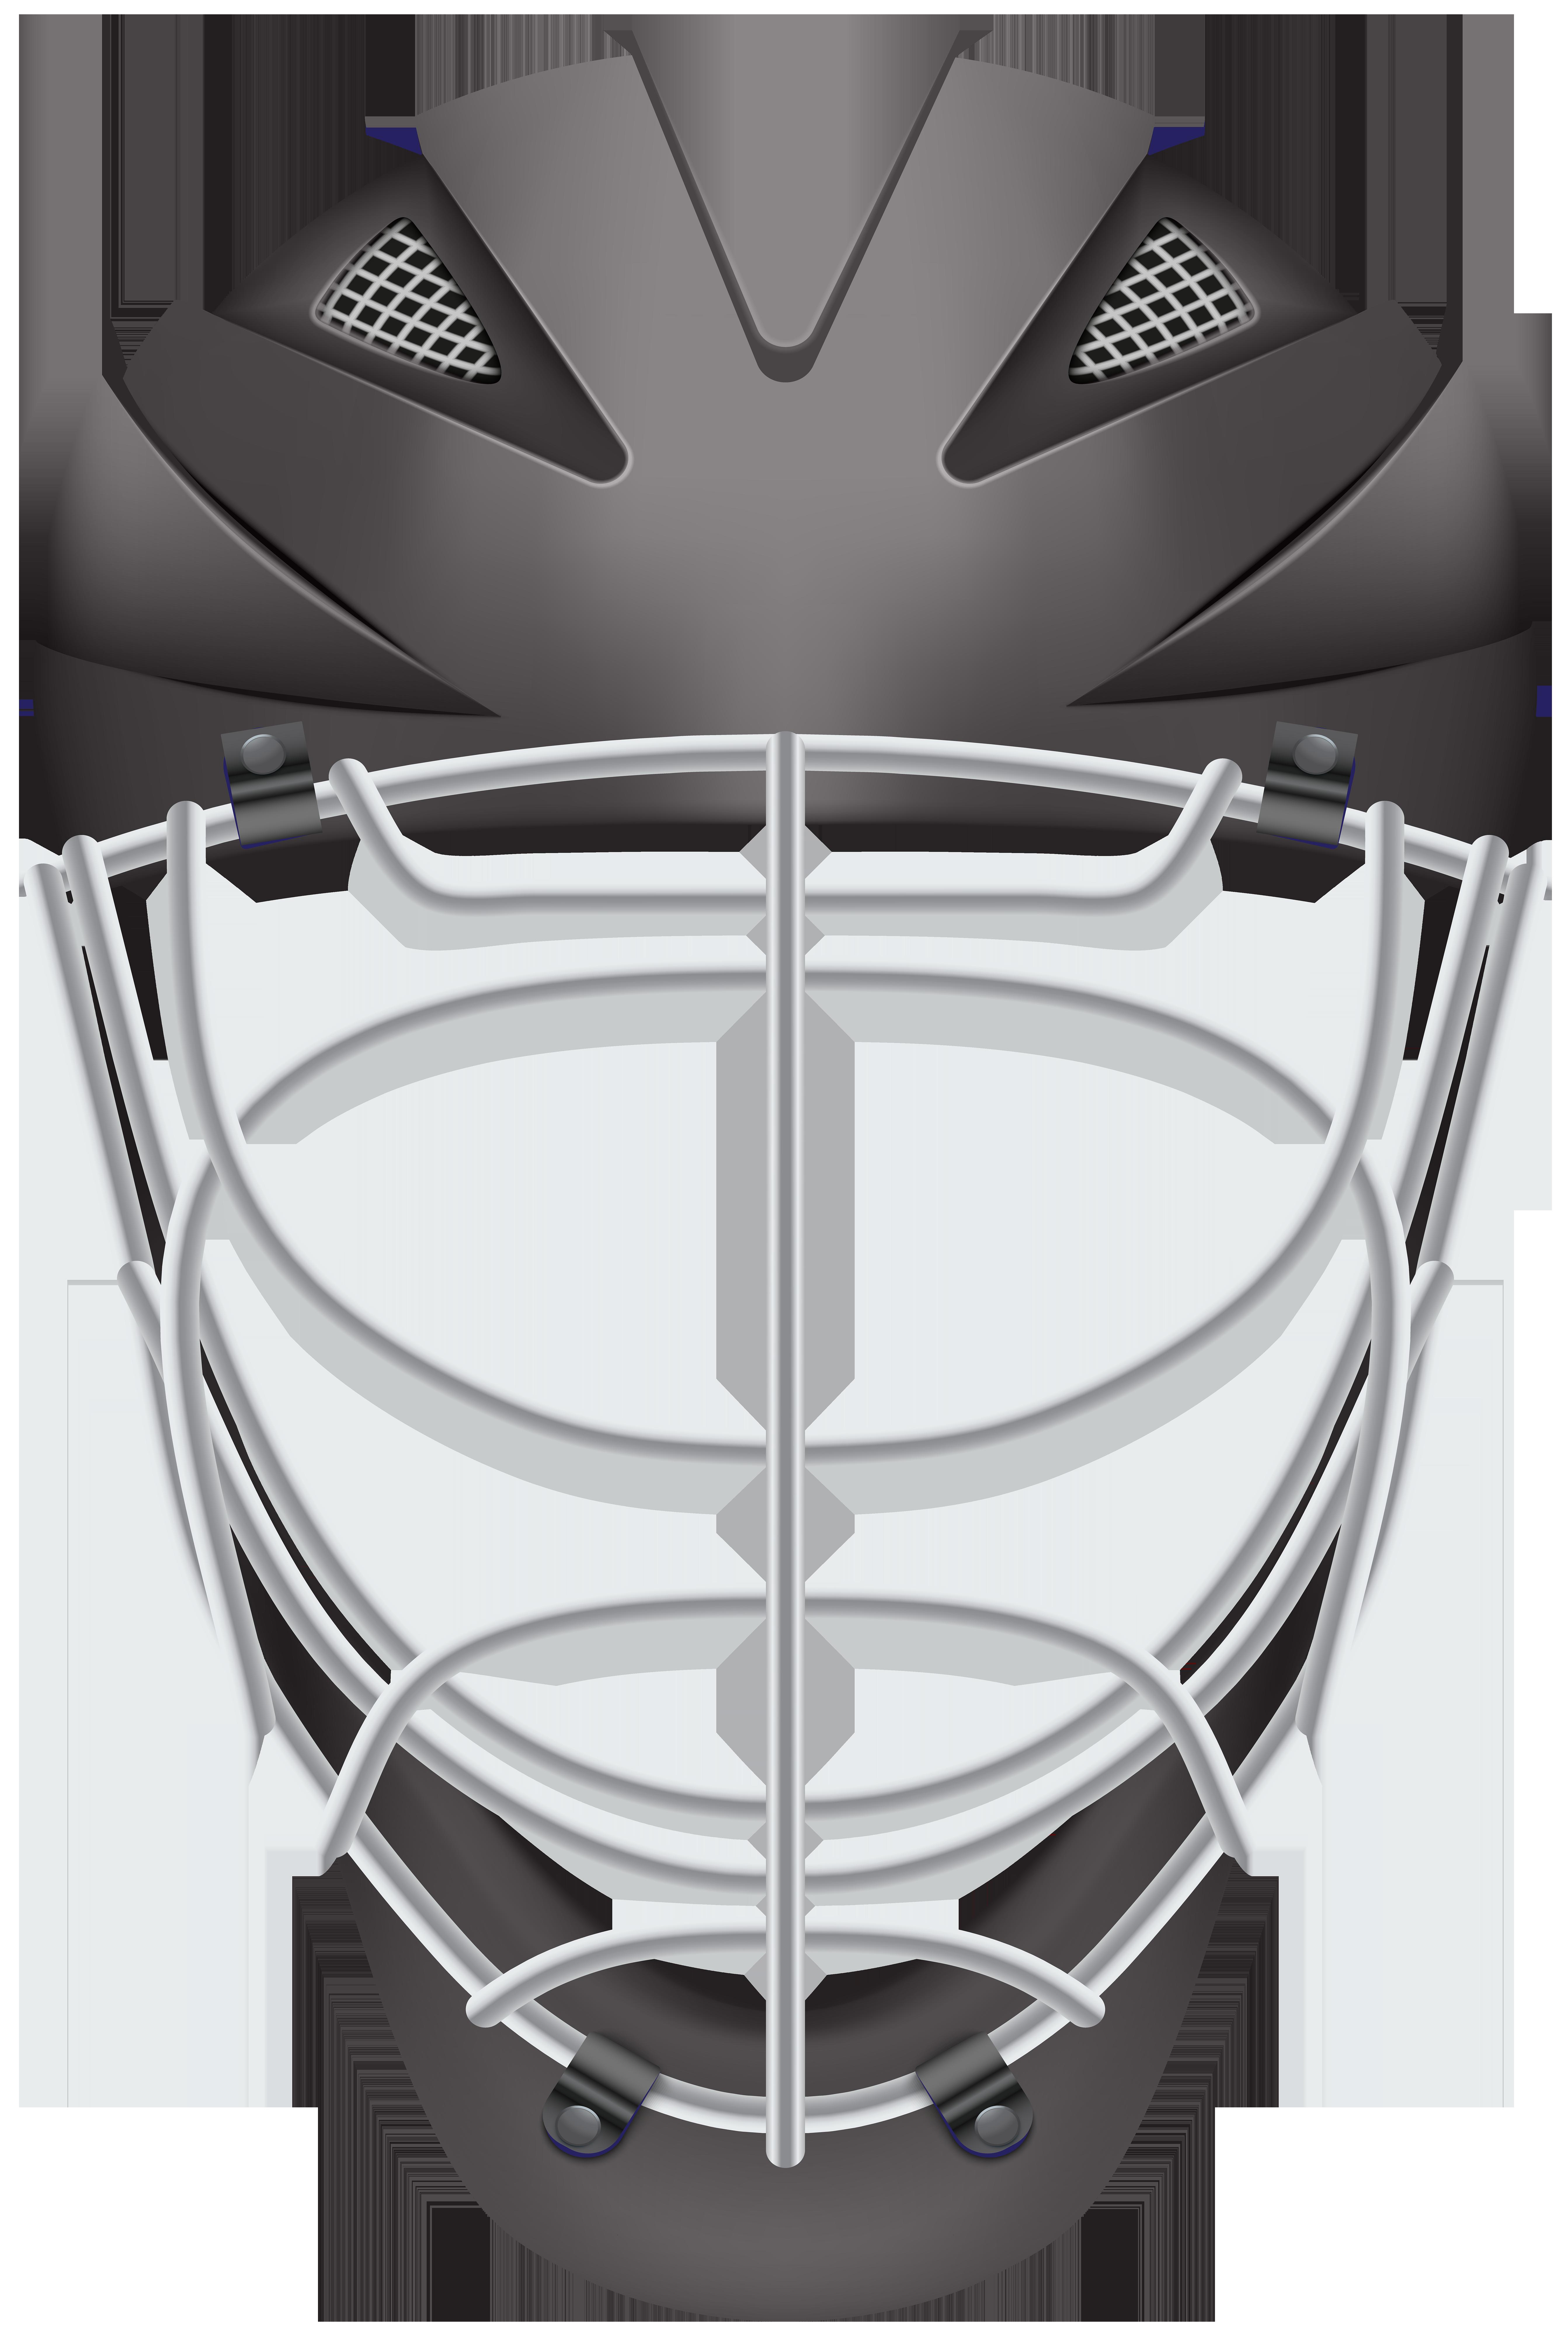 Clipart baseball helmet jpg library library Hockey Helmet Black PNG Clip Art | Gallery Yopriceville - High ... jpg library library